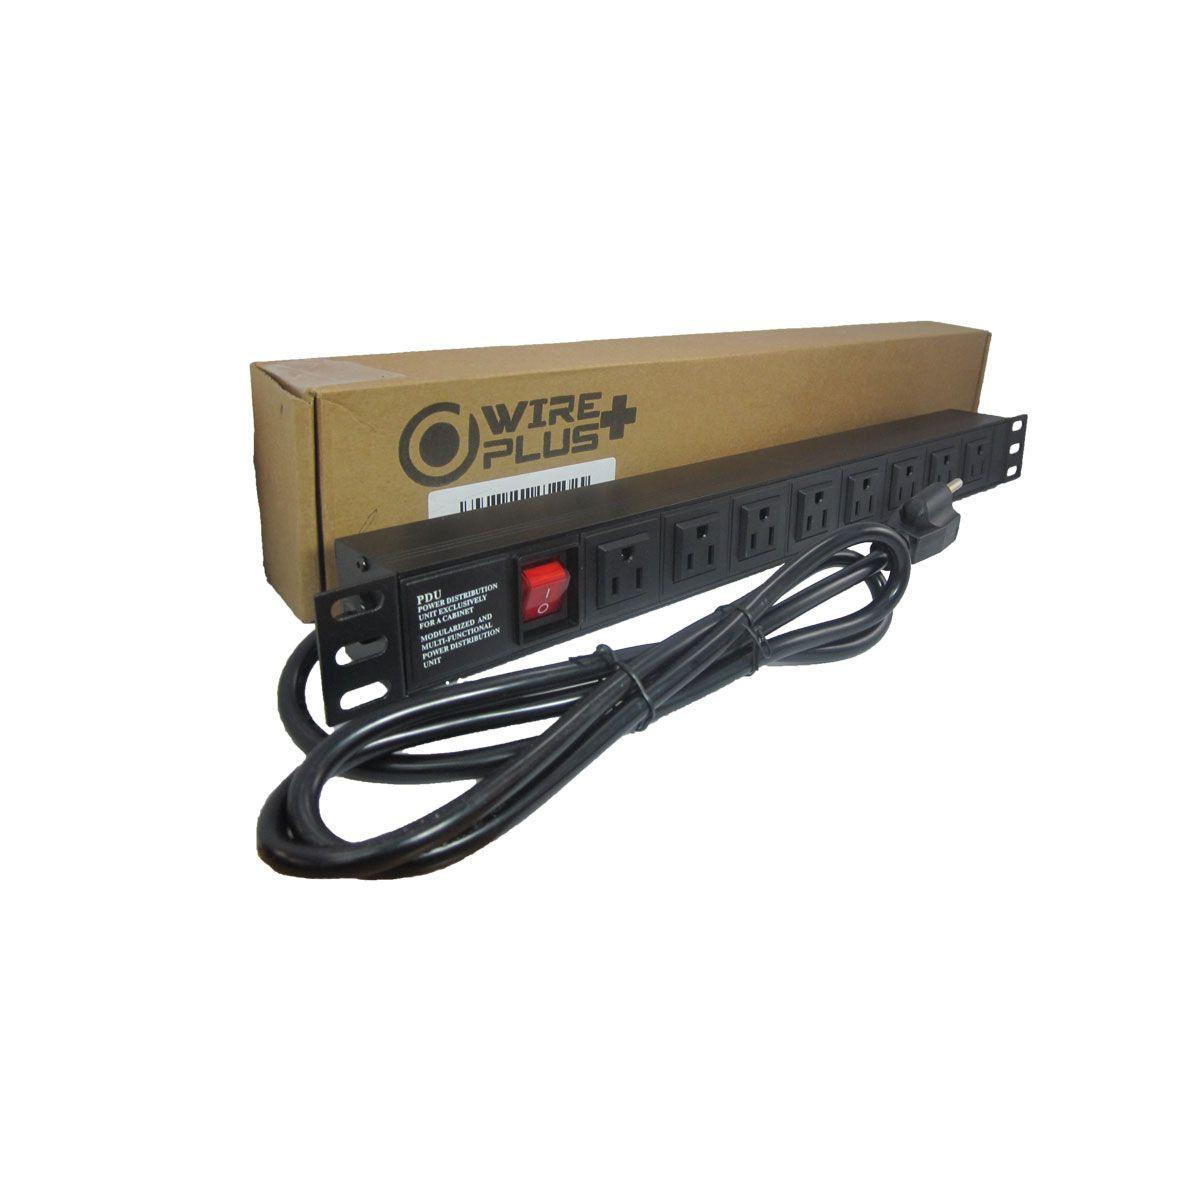 Regleta PDU Wireplus 8 Tomas rackqueable 1 U